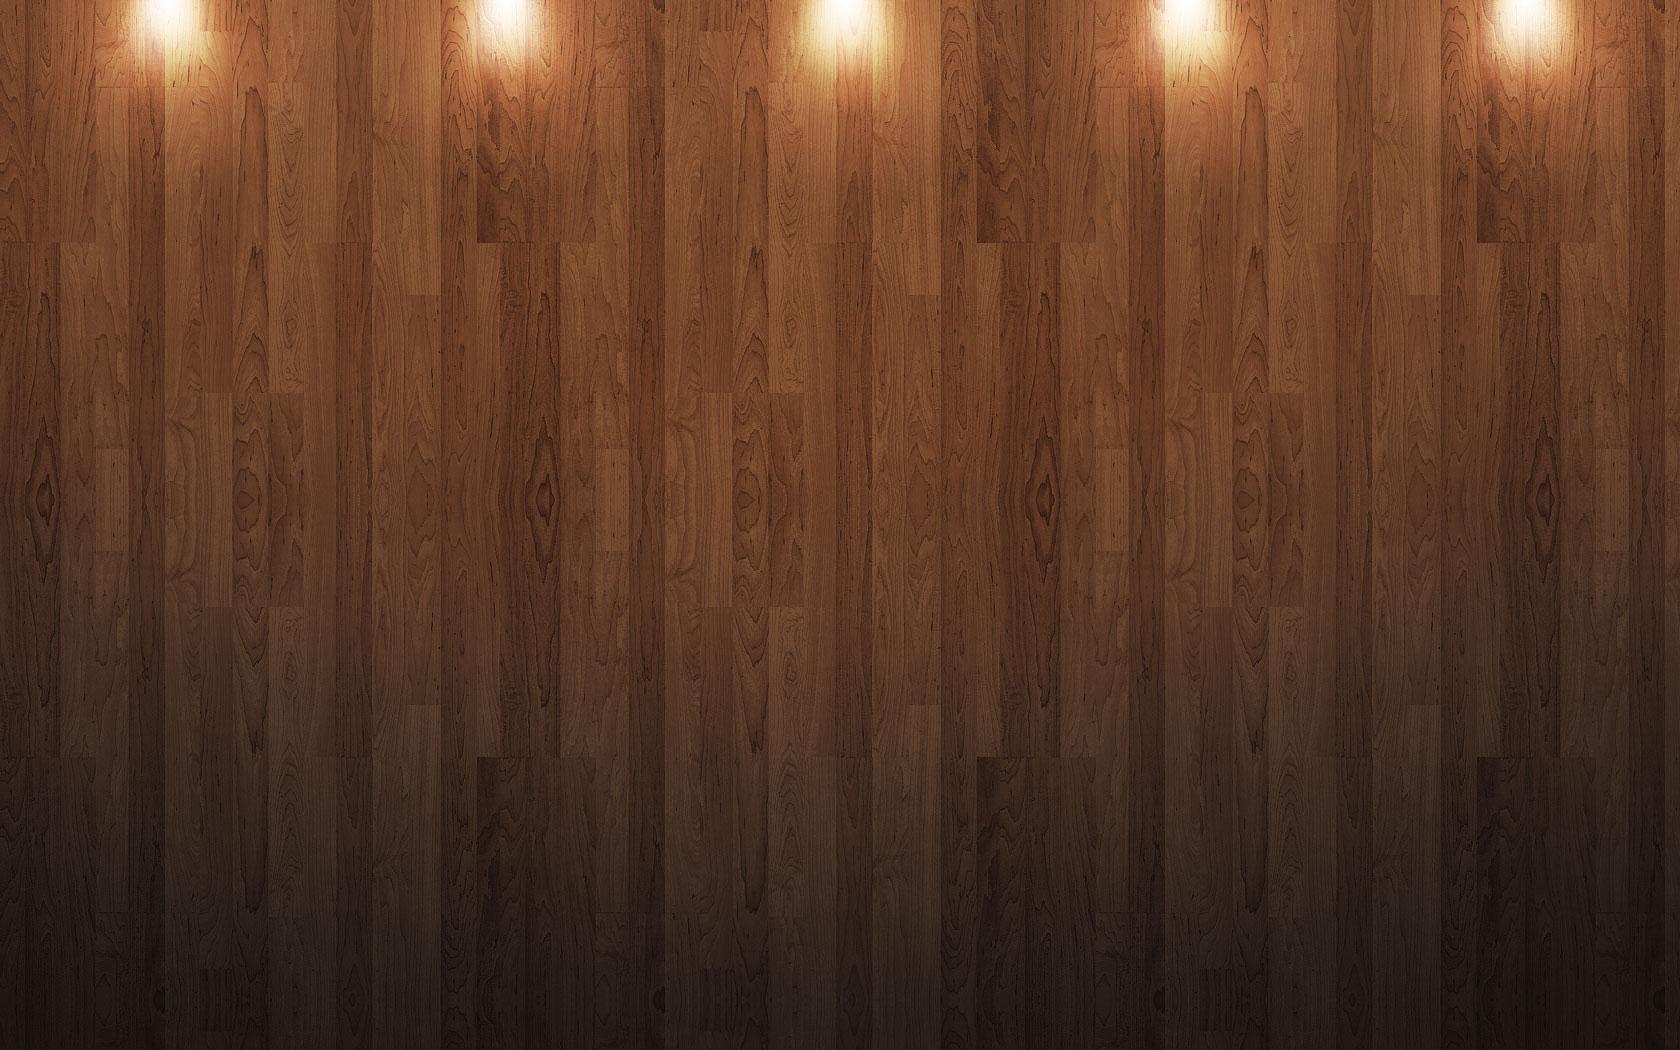 Marvellous Wood Floors Background Images Best inspiration home